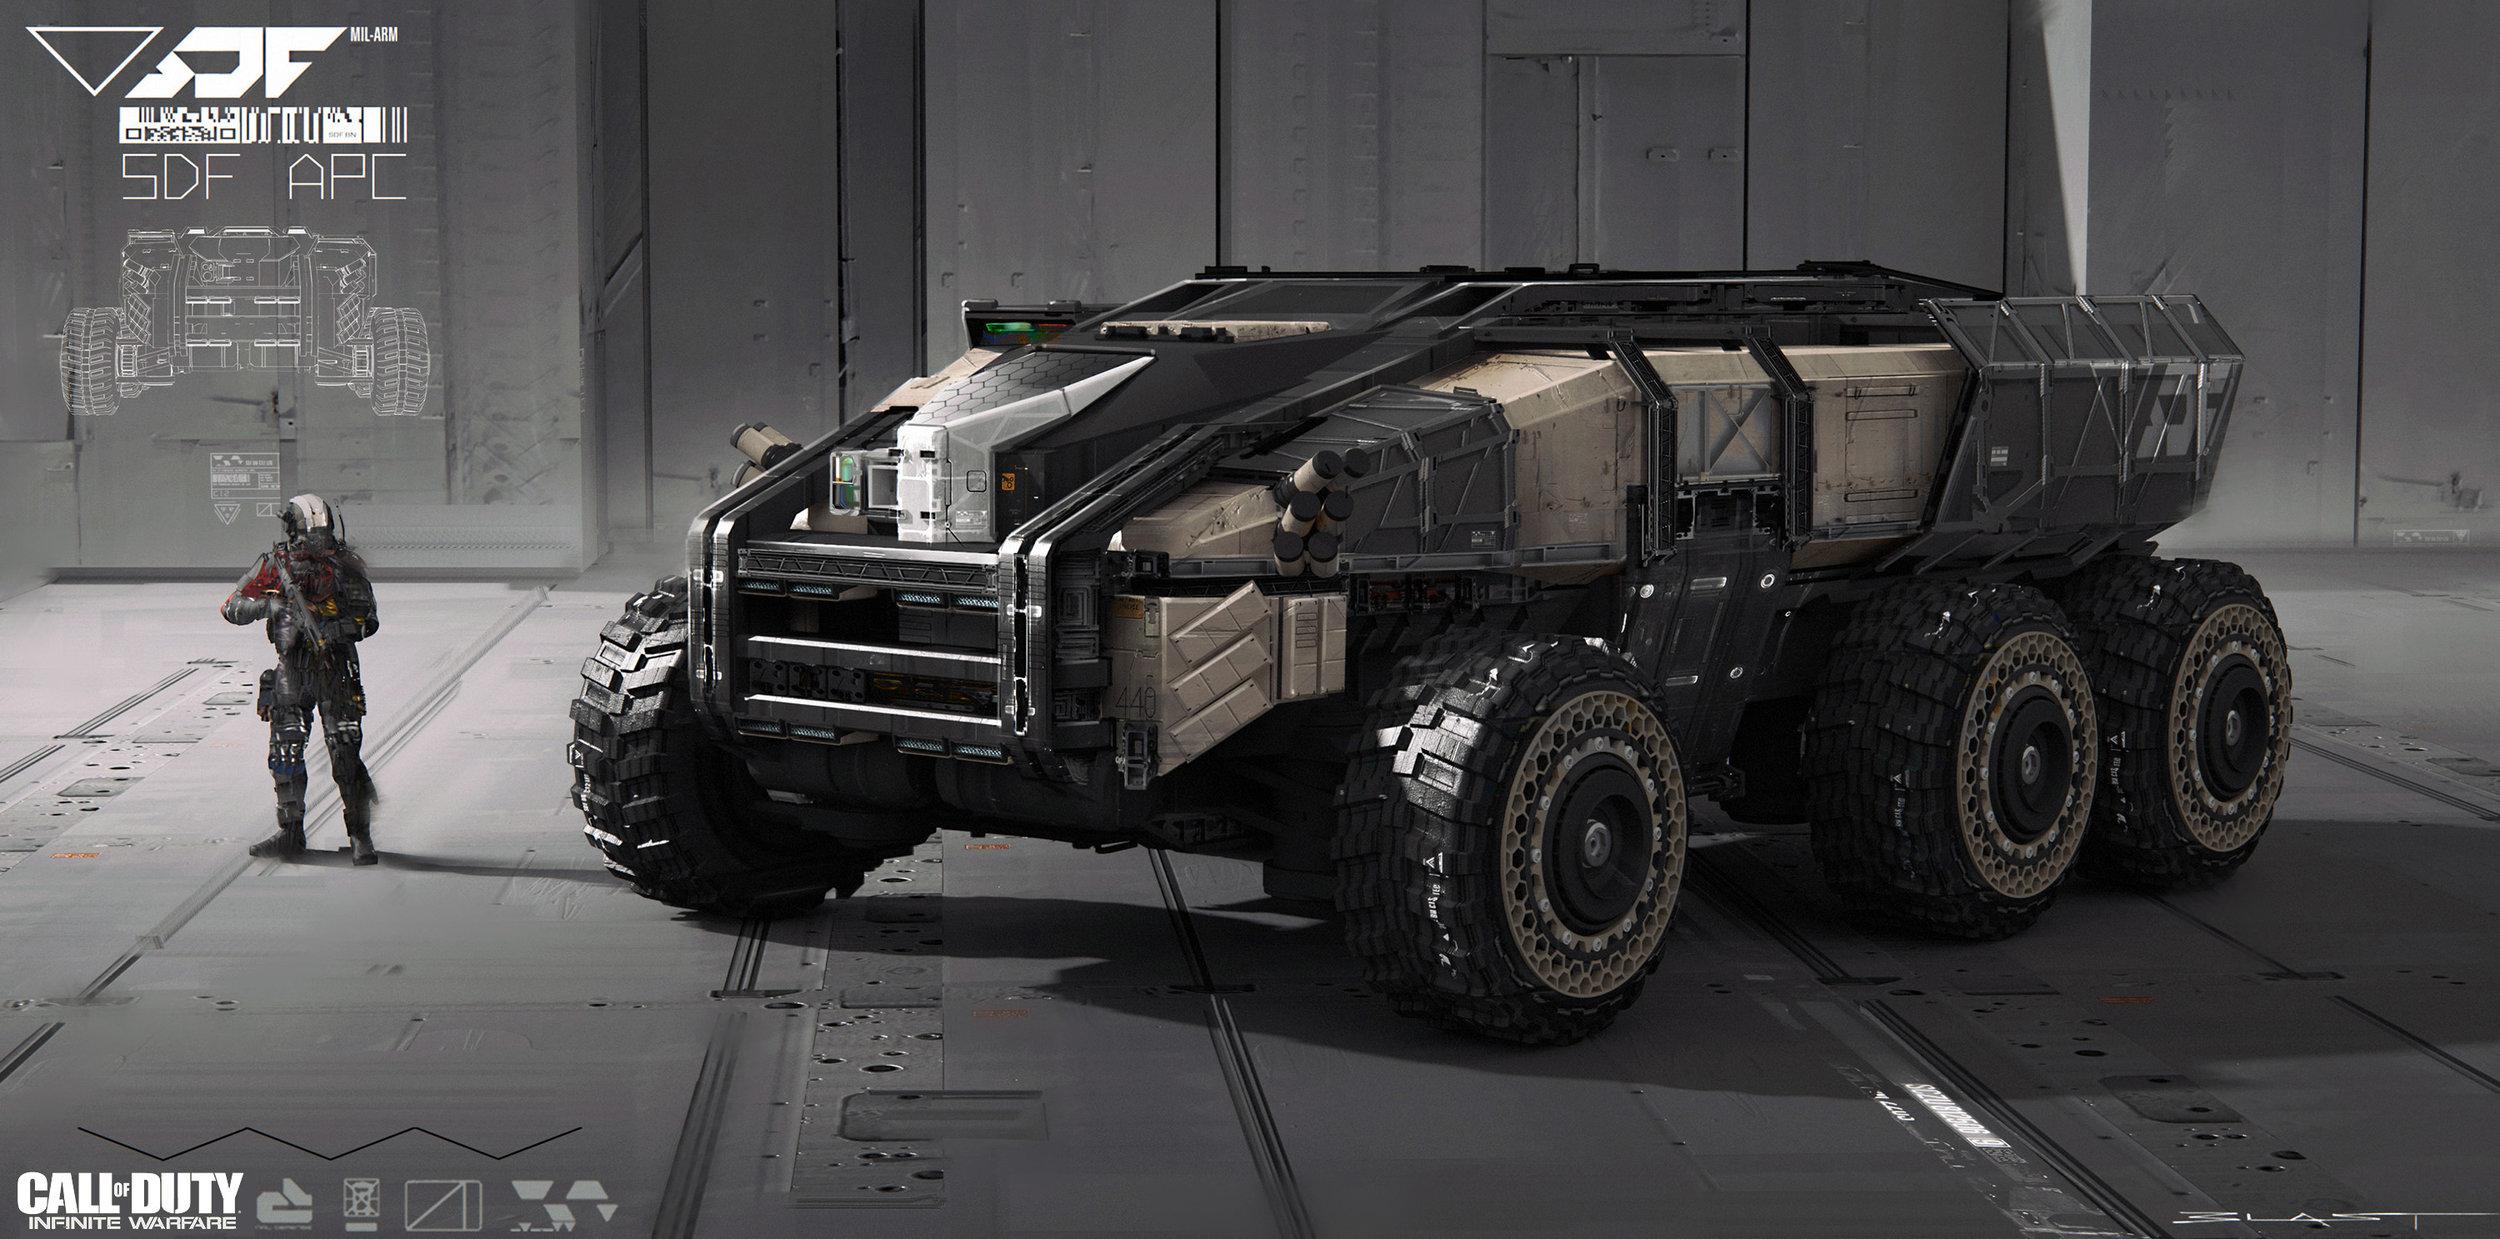 callofduty_benjaminlast_apc_vehicledesign_concept_1